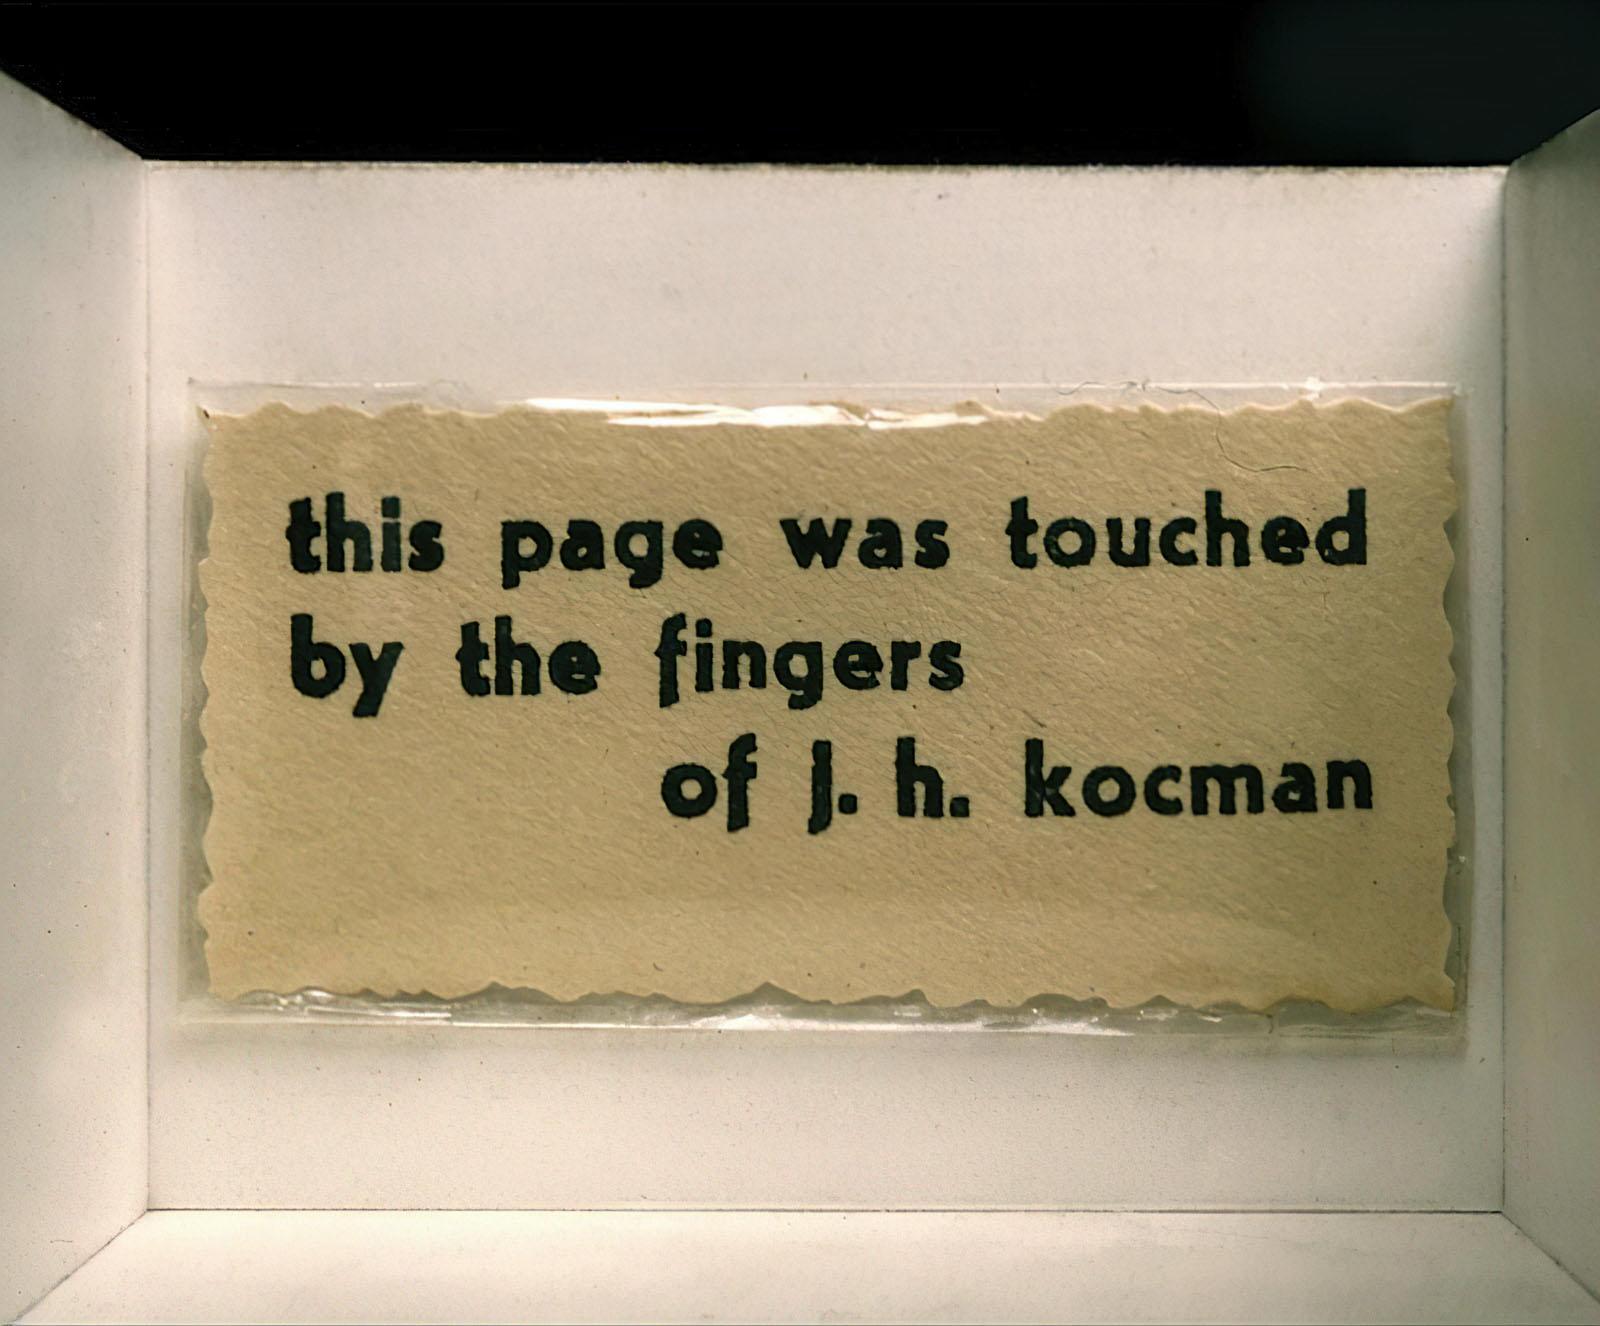 J.H. Kocman - Untitled